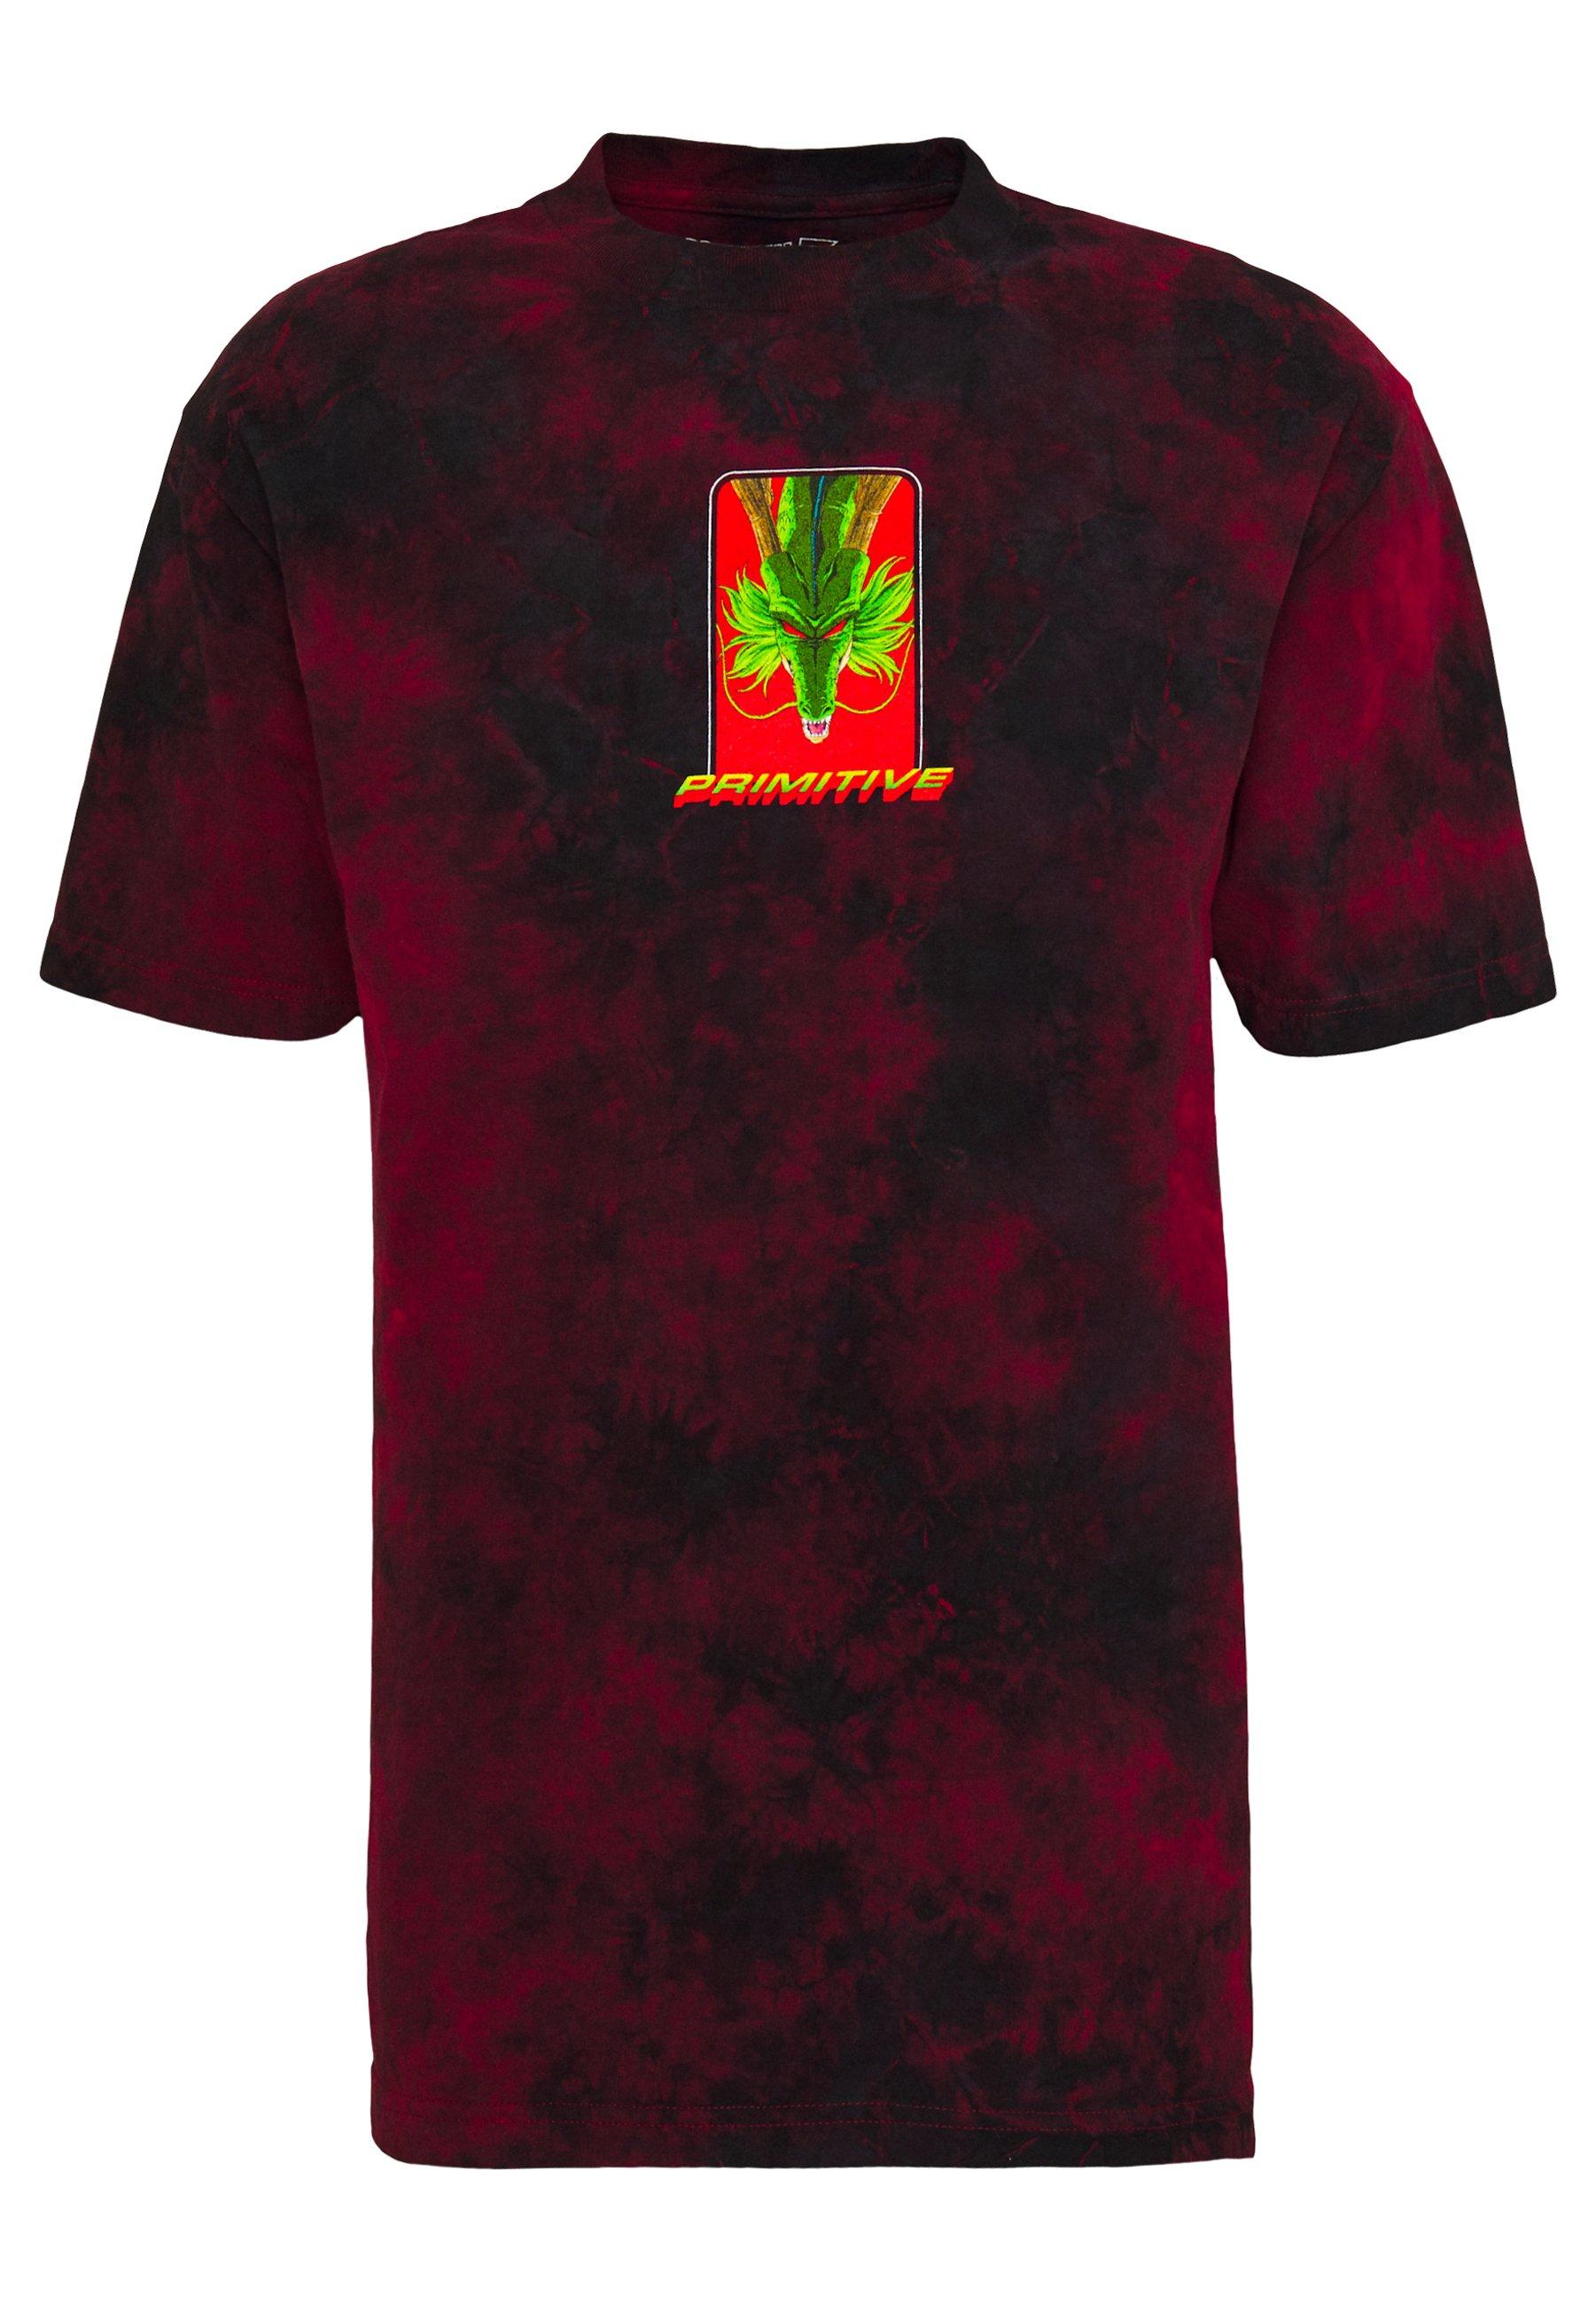 Primitive Shenron Wish Washed Dragon Ball Z - T-shirt Imprimé Red/black Wash